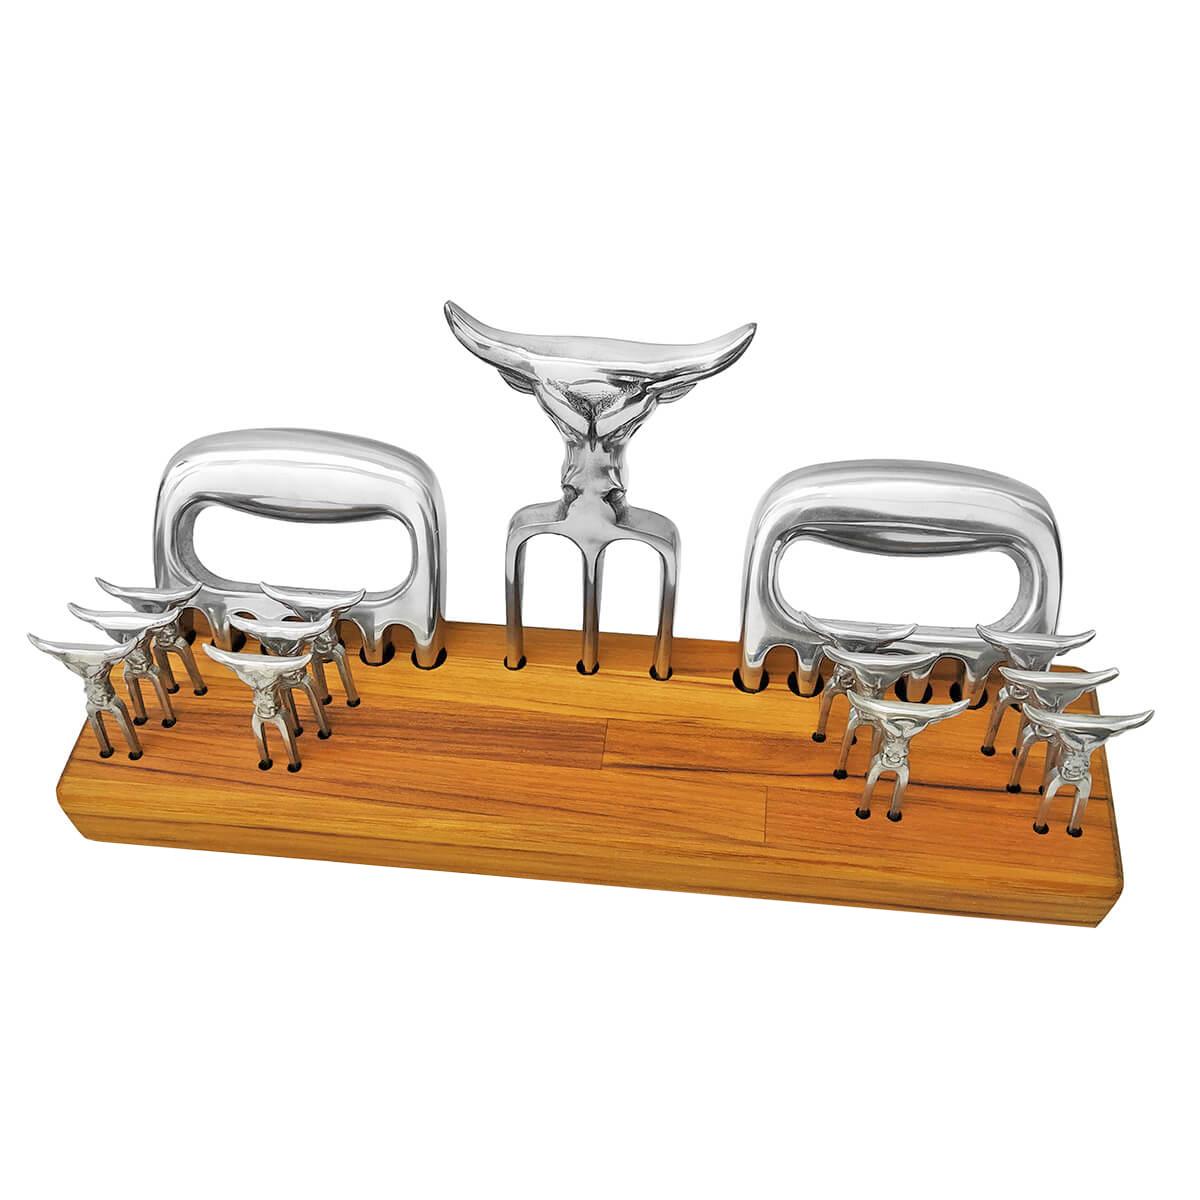 Kit 2 Garras + Tridente + 12 Mini Tridente + Base Personalizado para Churrasco